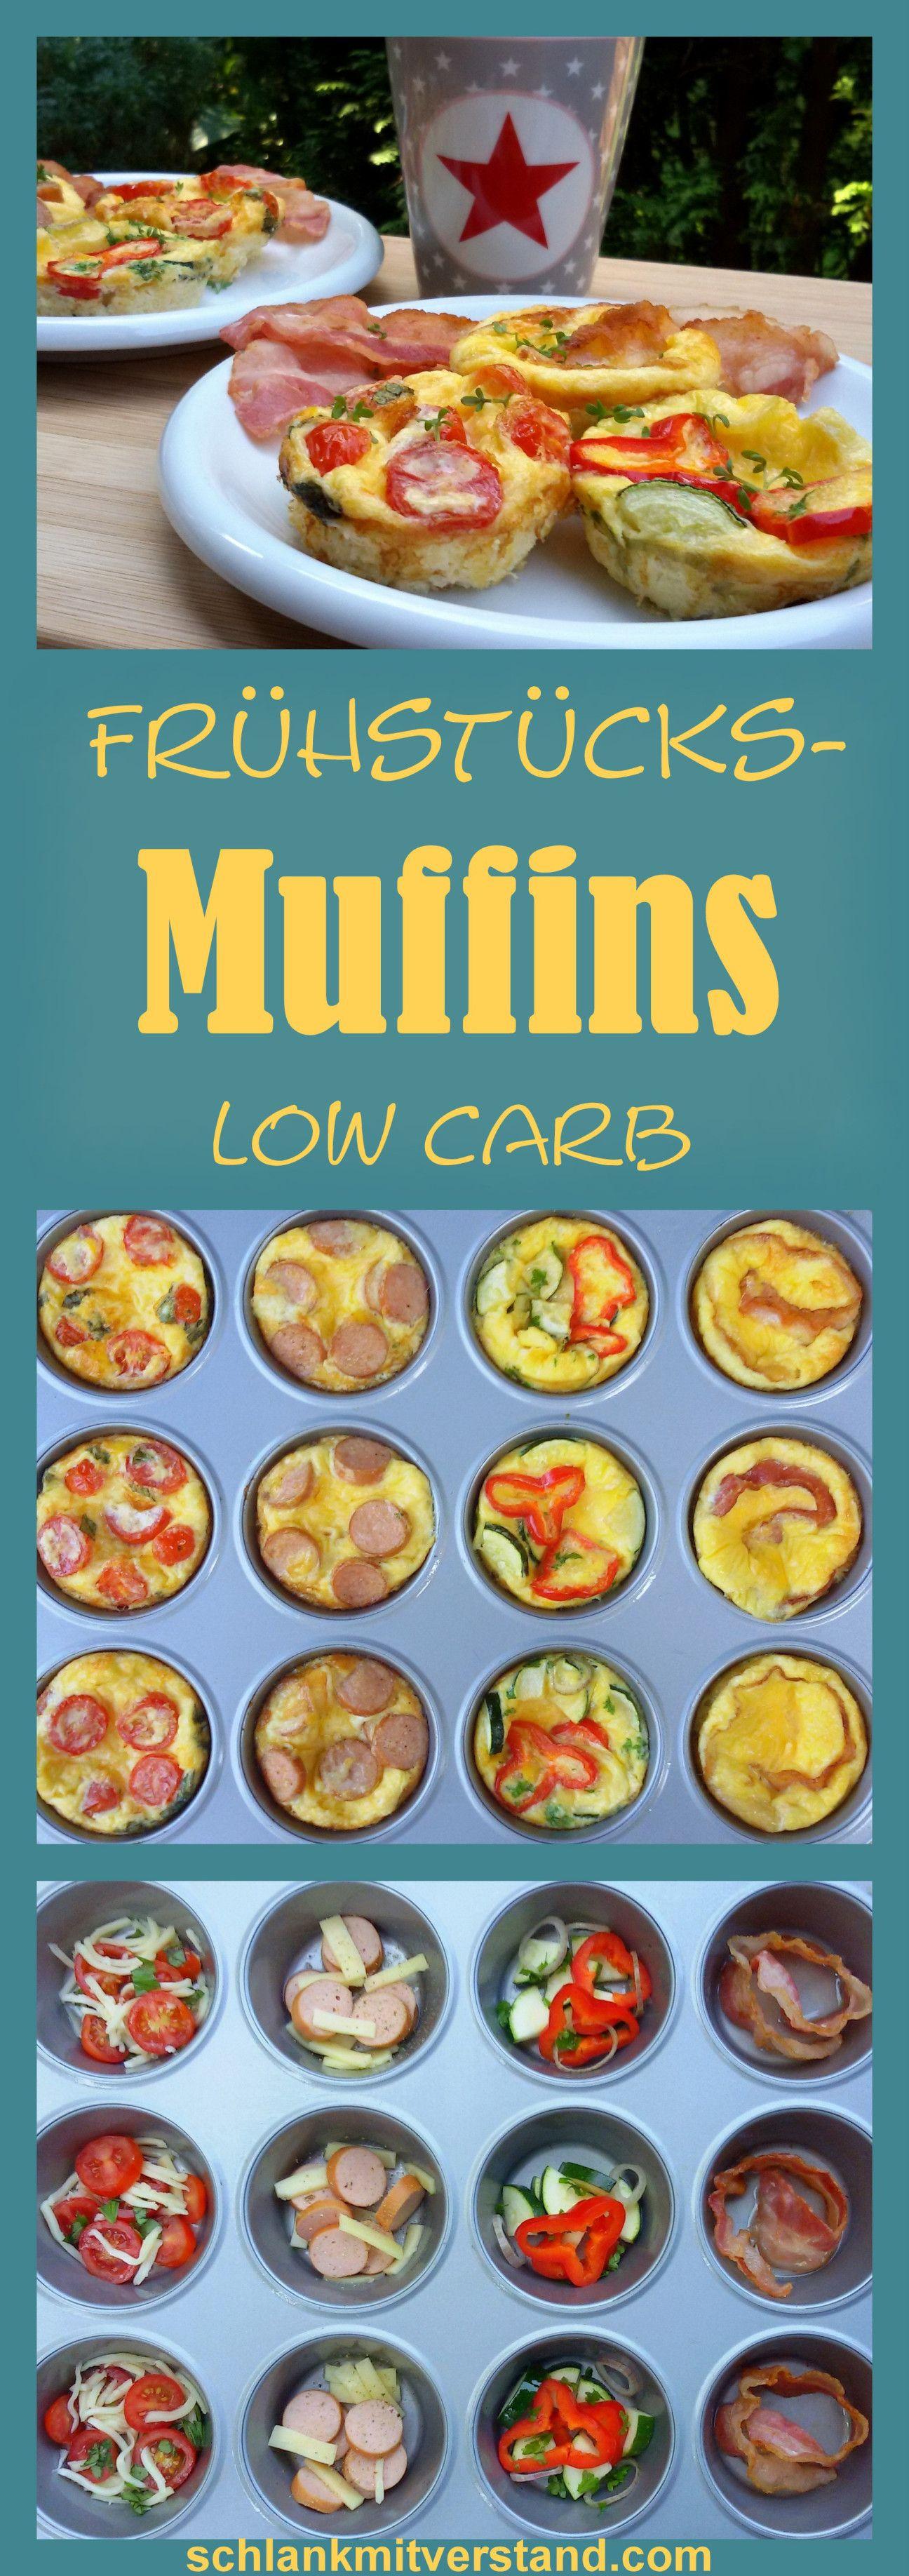 Photo of Frühstücks-Muffins mit Ei low carb